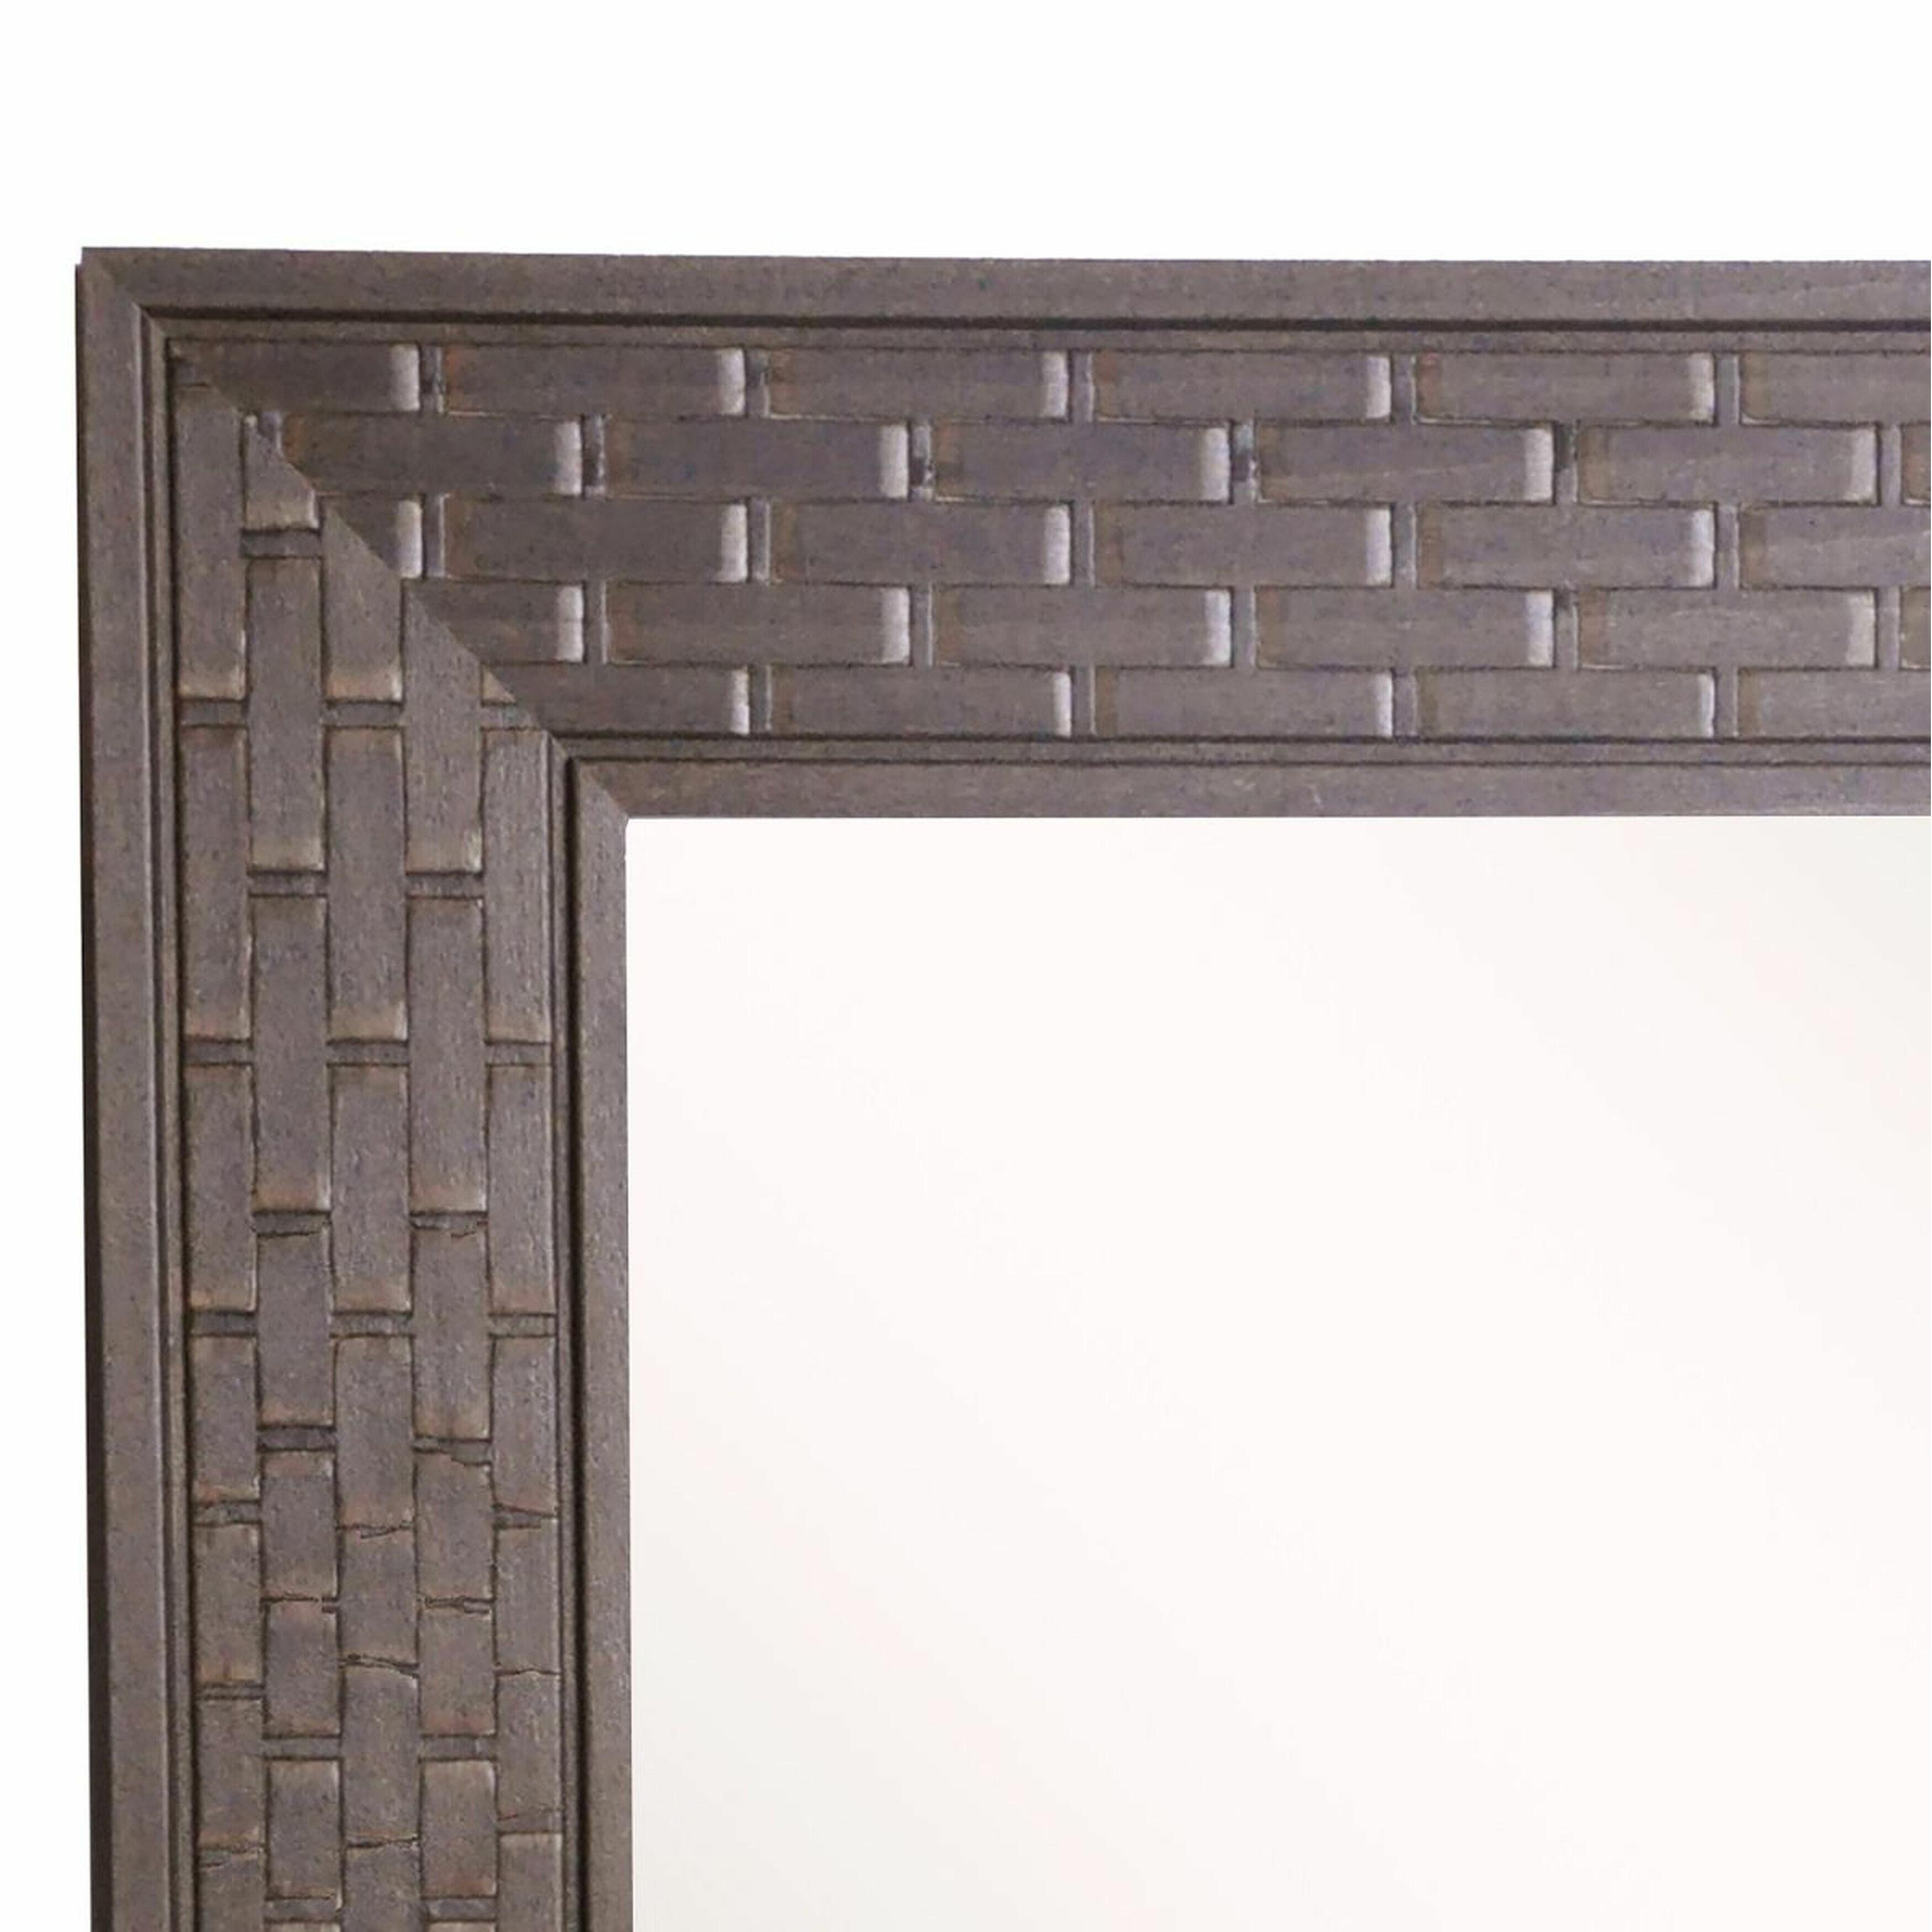 Rayne Mirrors Jovie Jane Espresso Bricks Full Length